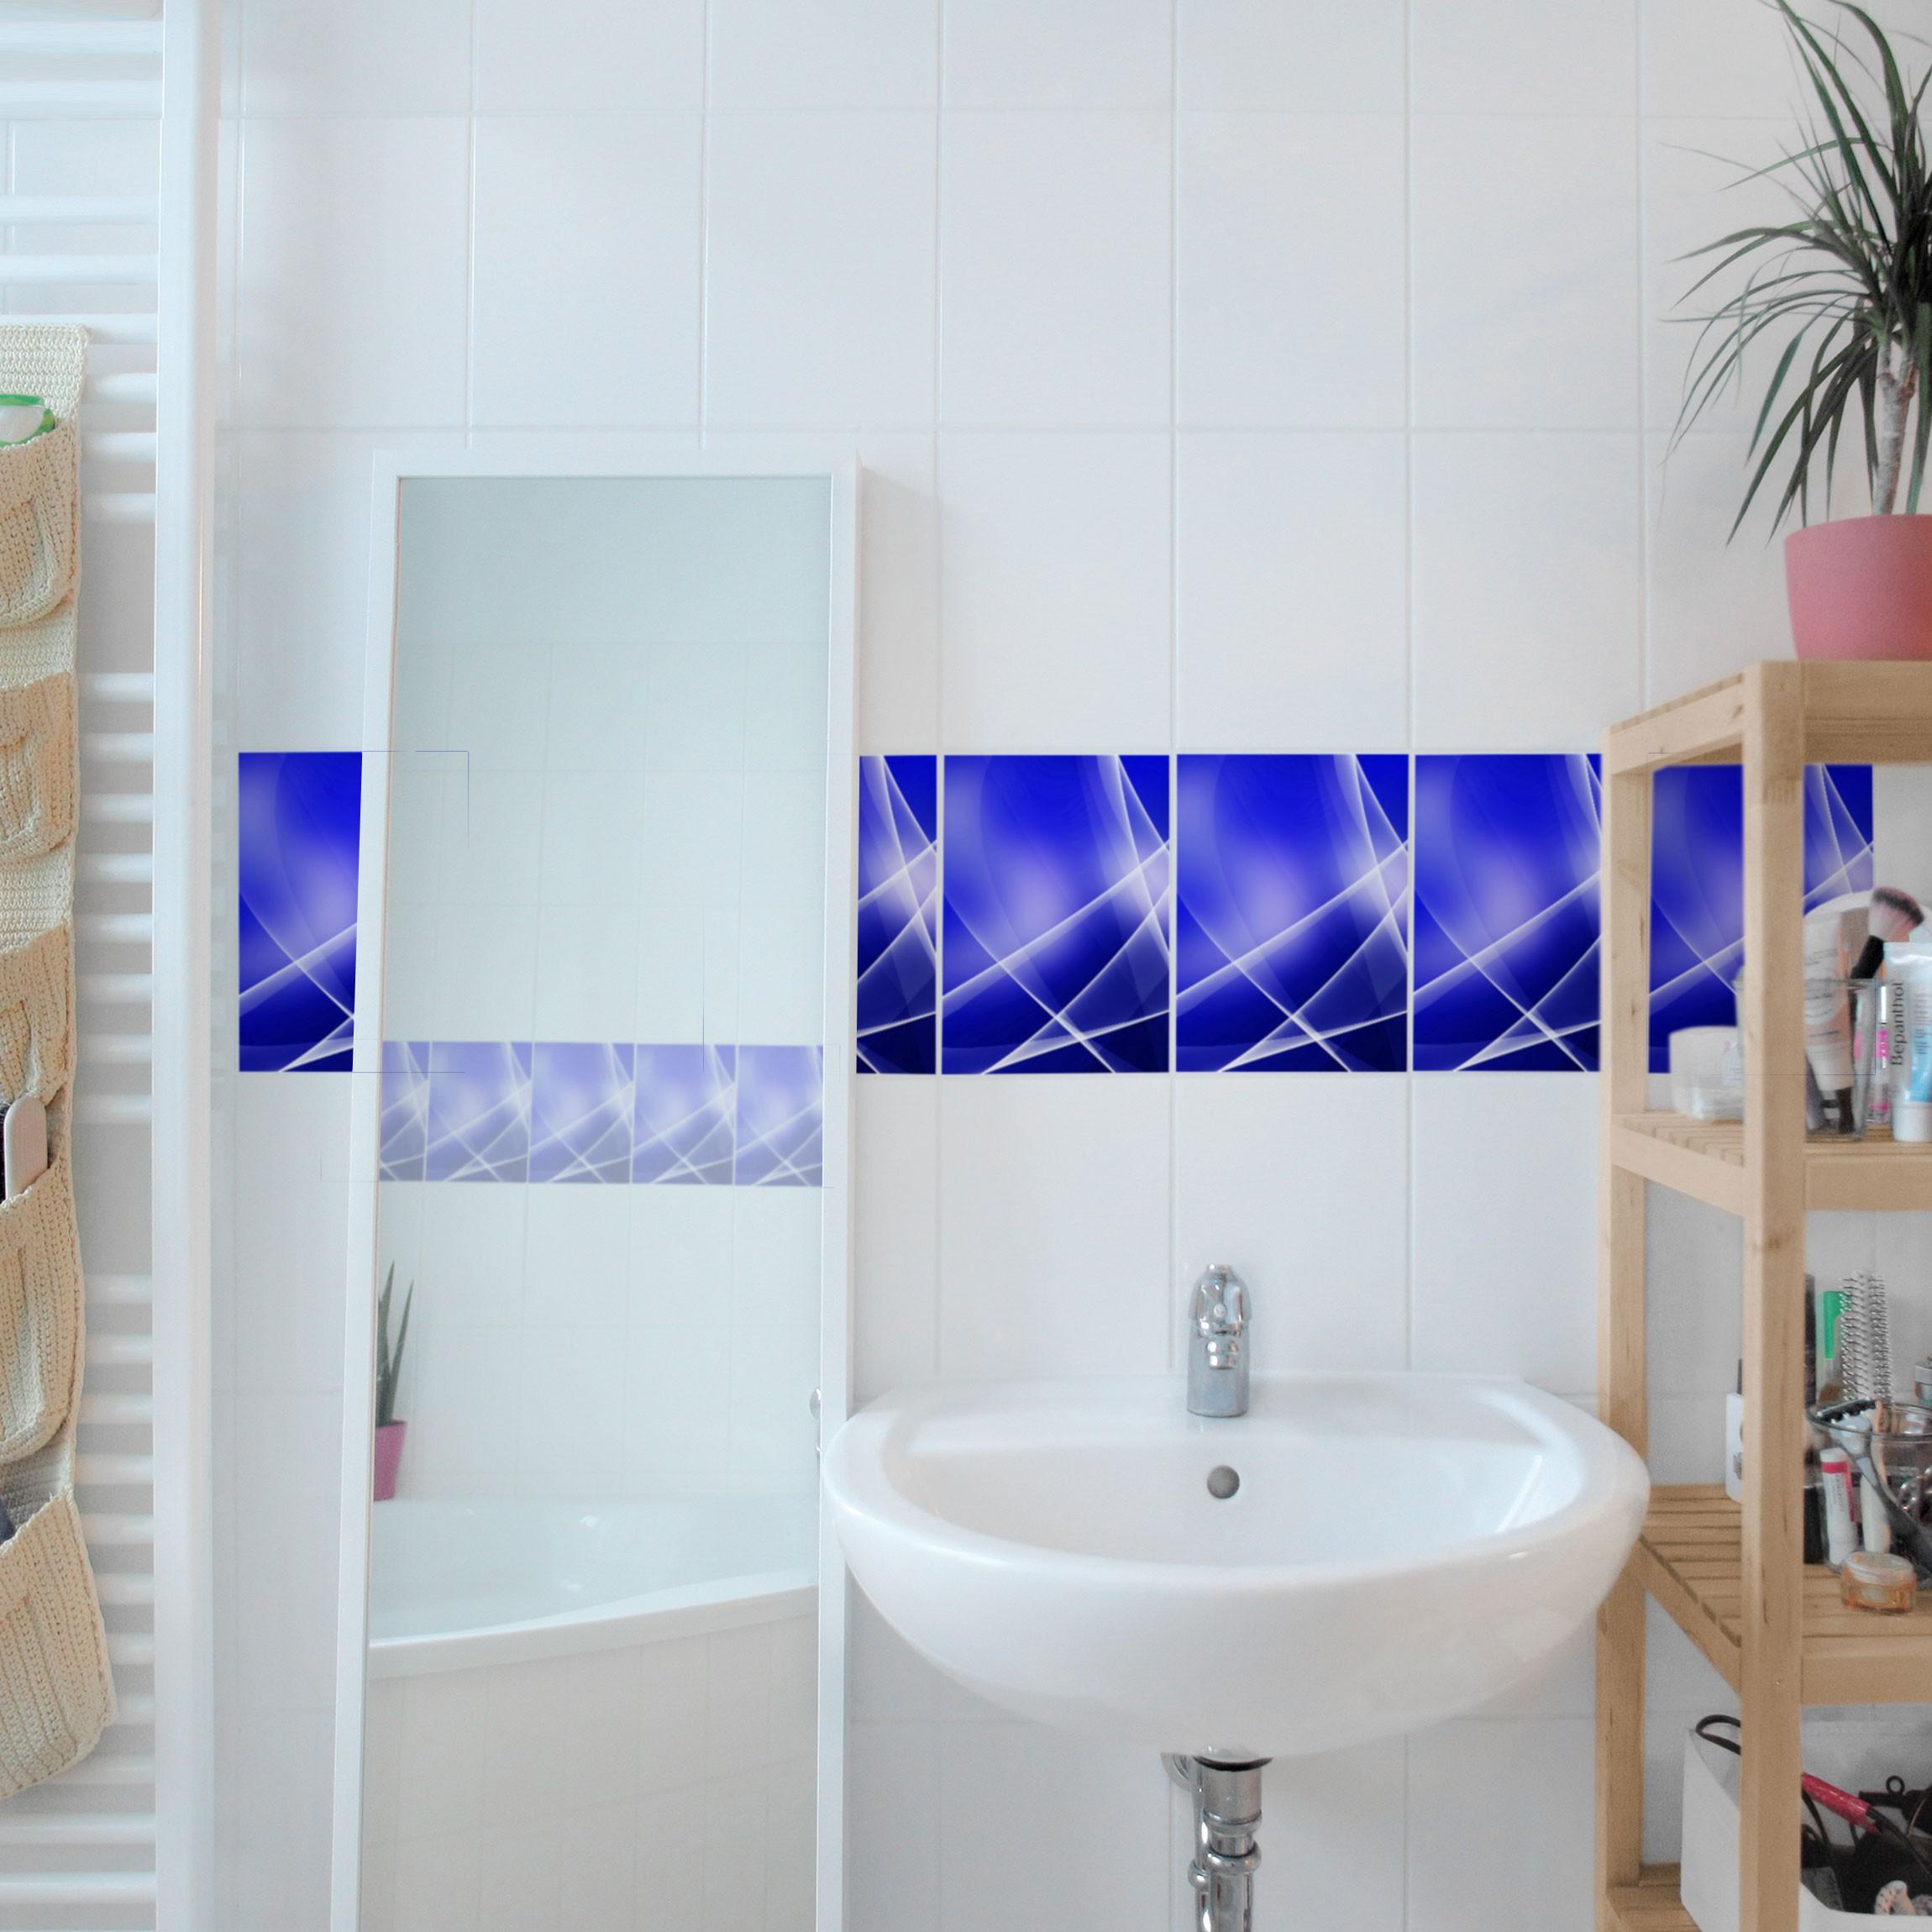 fliesen bord re blue disco 20x15 cm fliesenaufkleber. Black Bedroom Furniture Sets. Home Design Ideas